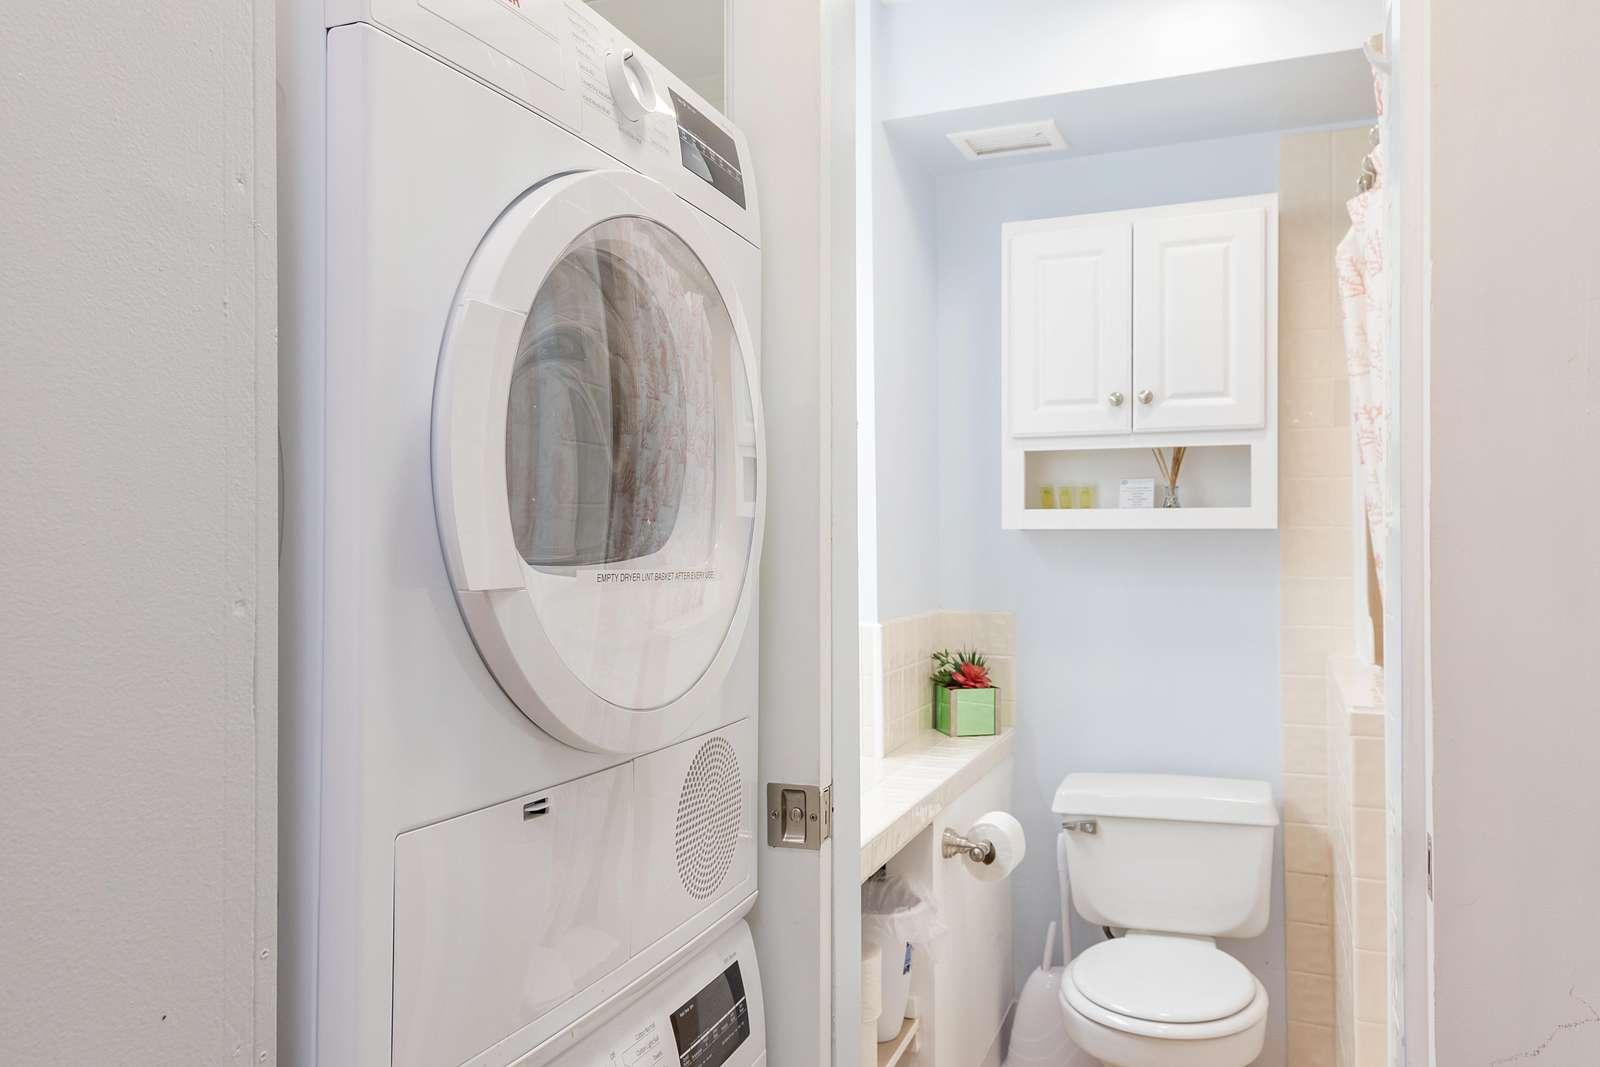 Washer/Dryer & Bathroom